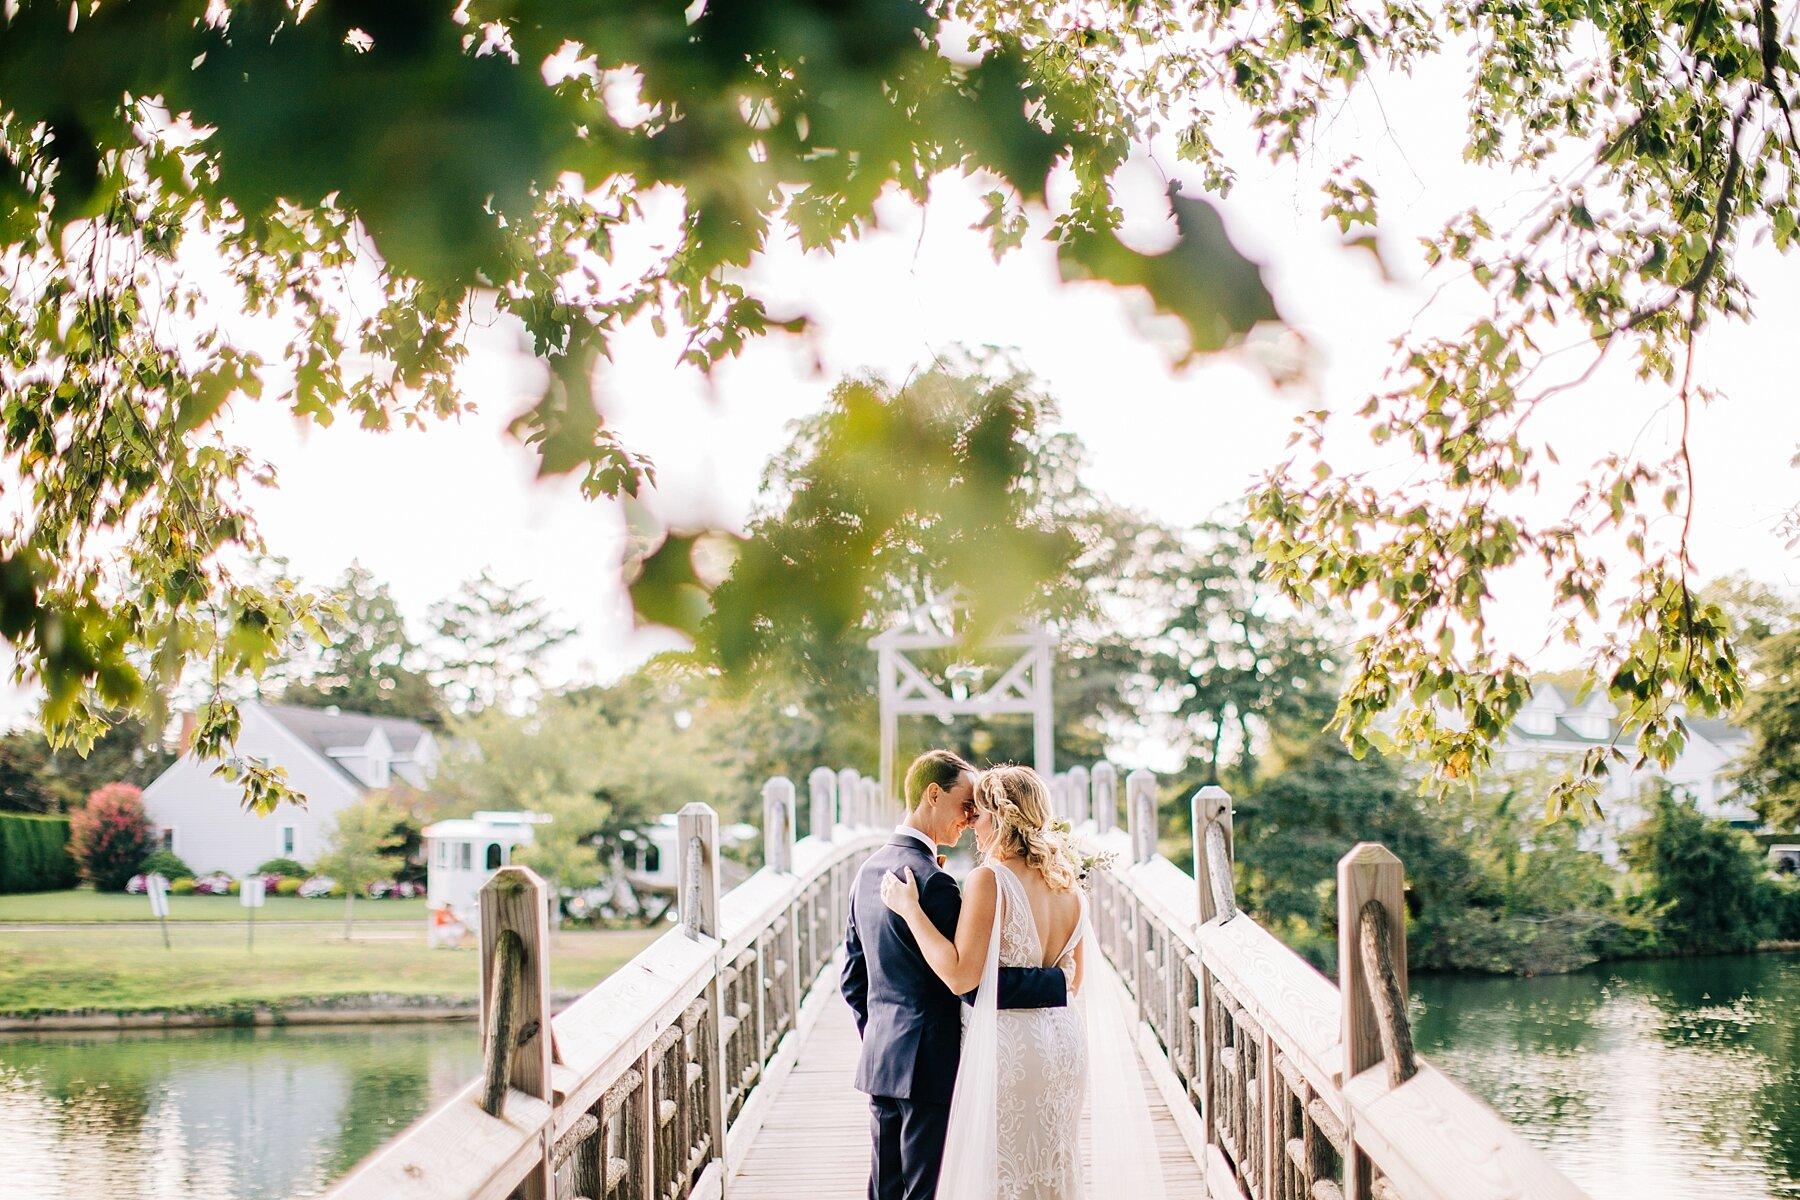 the-mill-lakeside-manor-spring-lake-wedding-photographer_0031.jpg